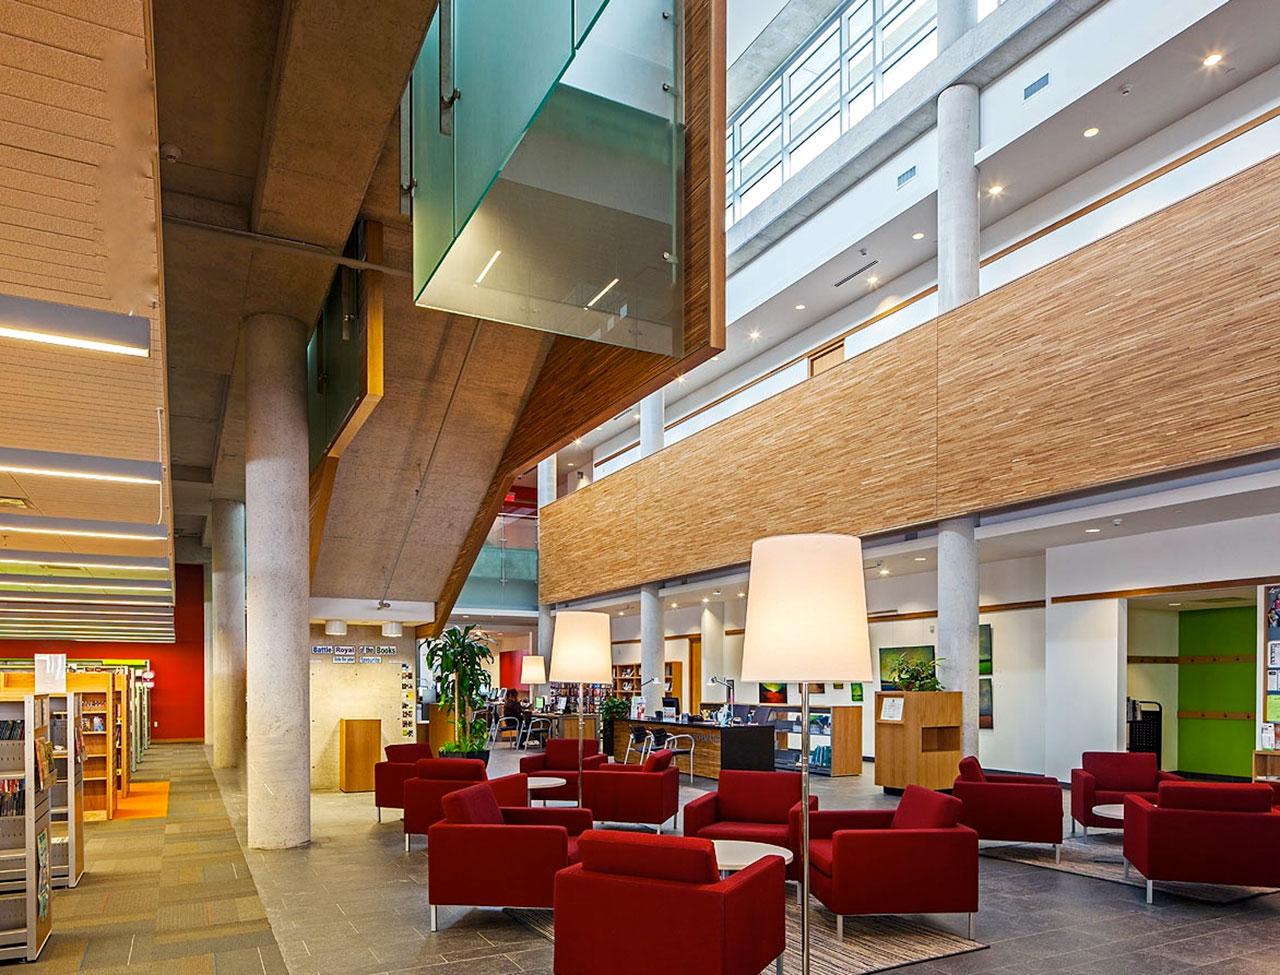 Bradford West Gwillimbary Library 4 - BNC.jpg